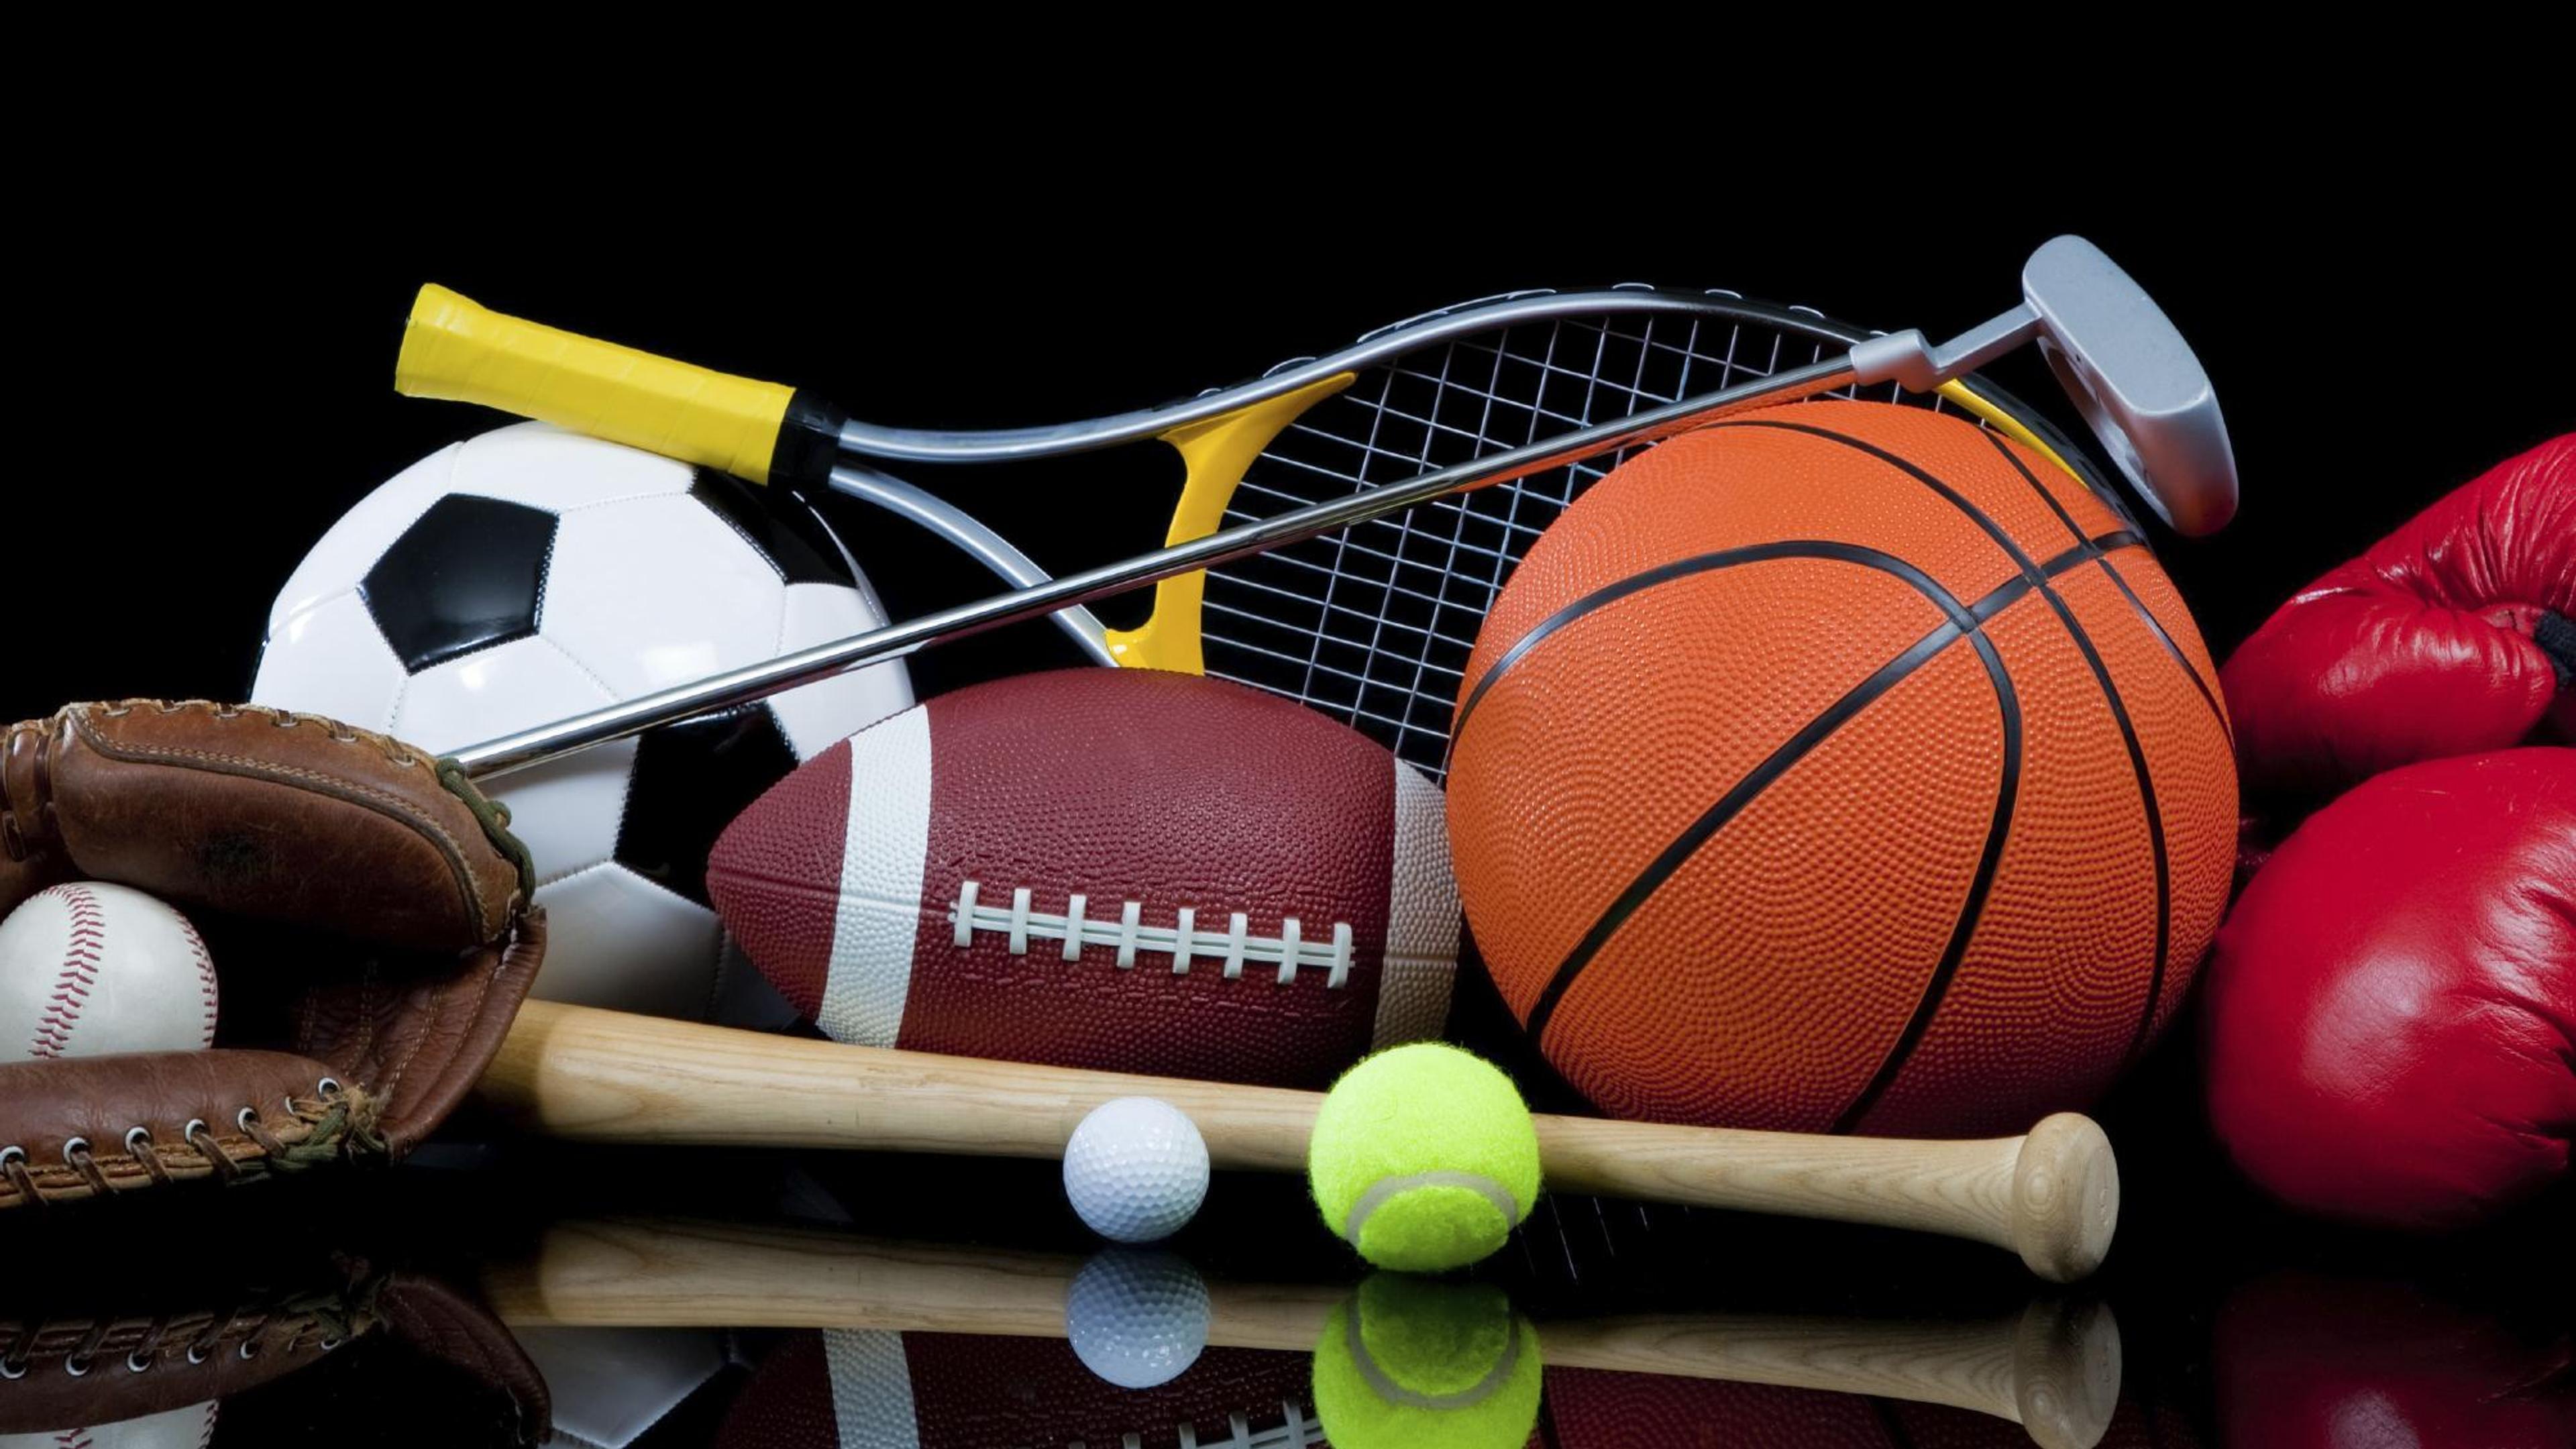 Download Wallpaper 3840x2160 Balls From All Sport